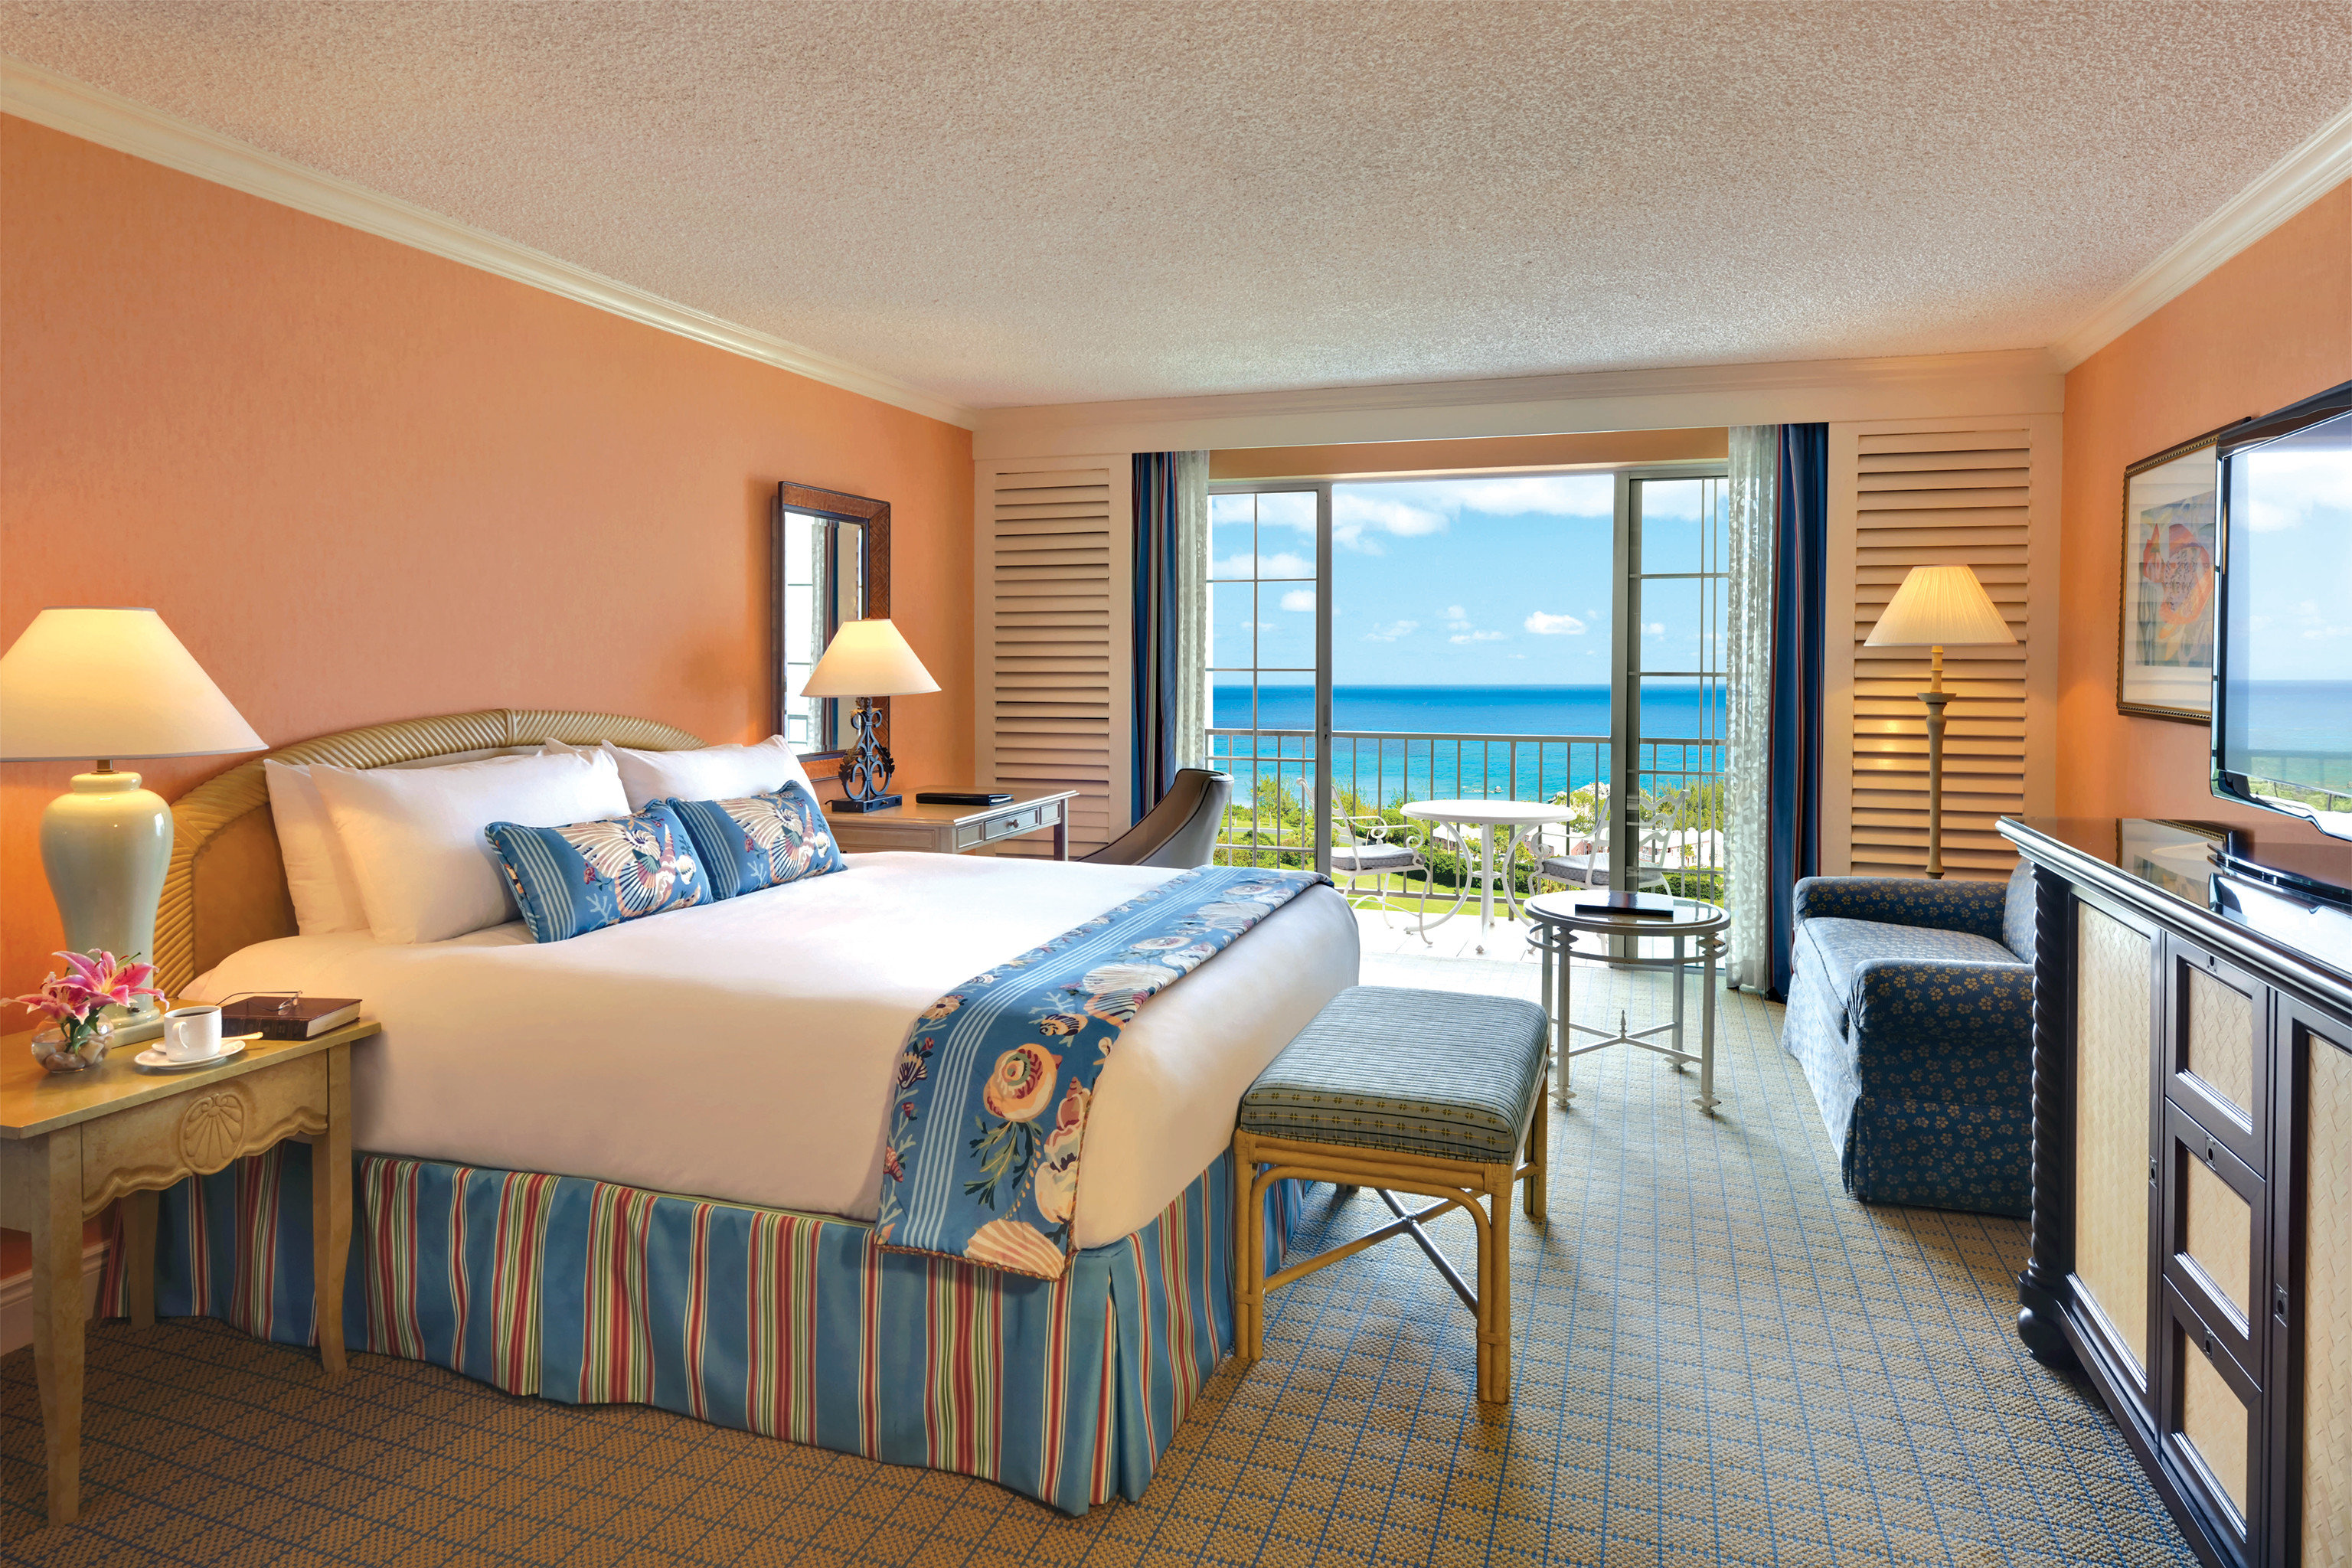 Balcony Bedroom Hotels Luxury Scenic views Suite sofa property Villa cottage Resort condominium home living room